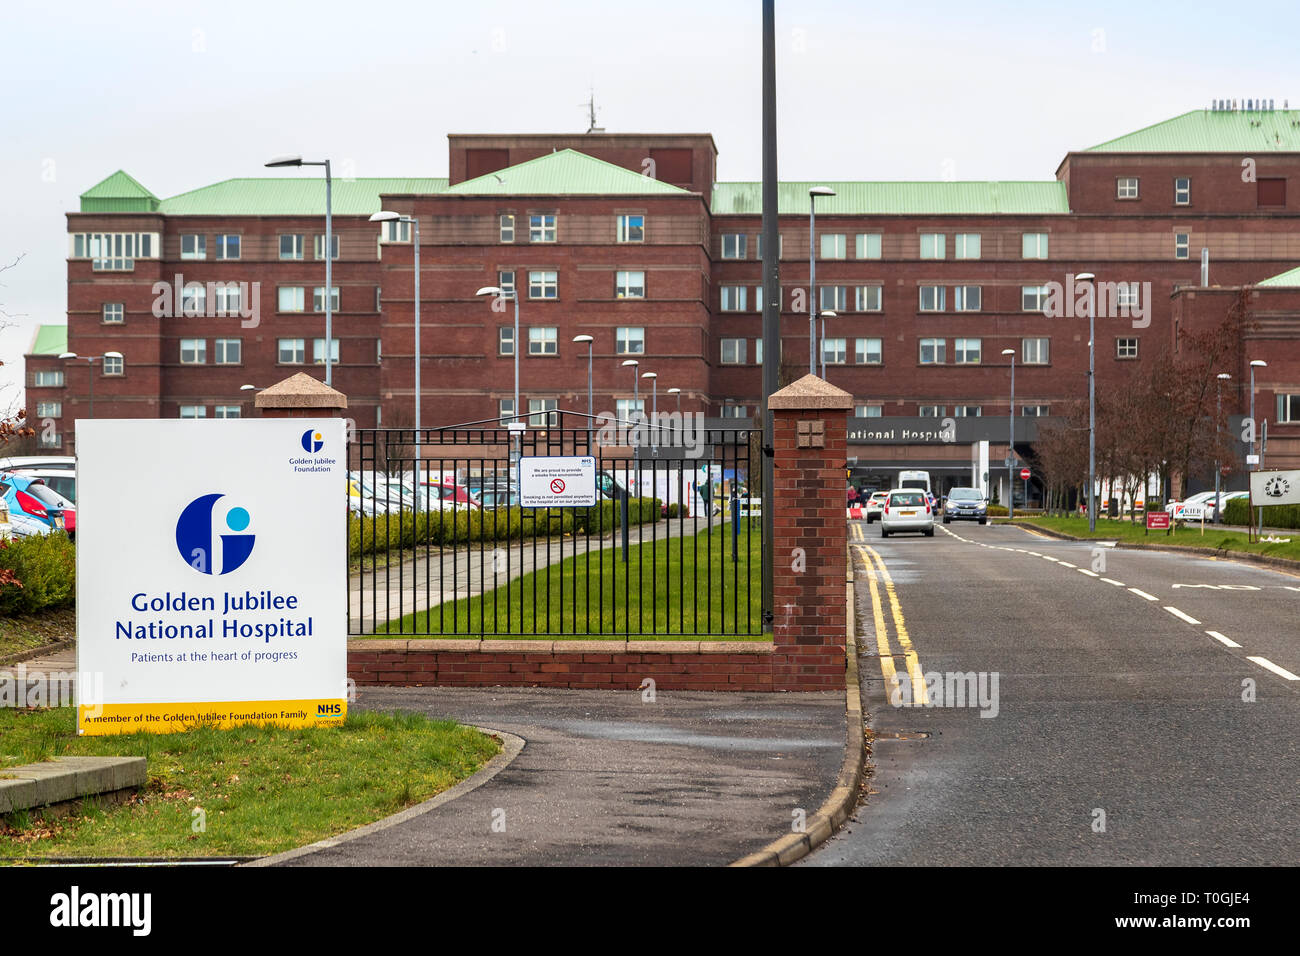 Entrance to the Scottish NHS Golden Jubilee National Hospital, Clydebank, Glasgow, Scotland, UK - Stock Image